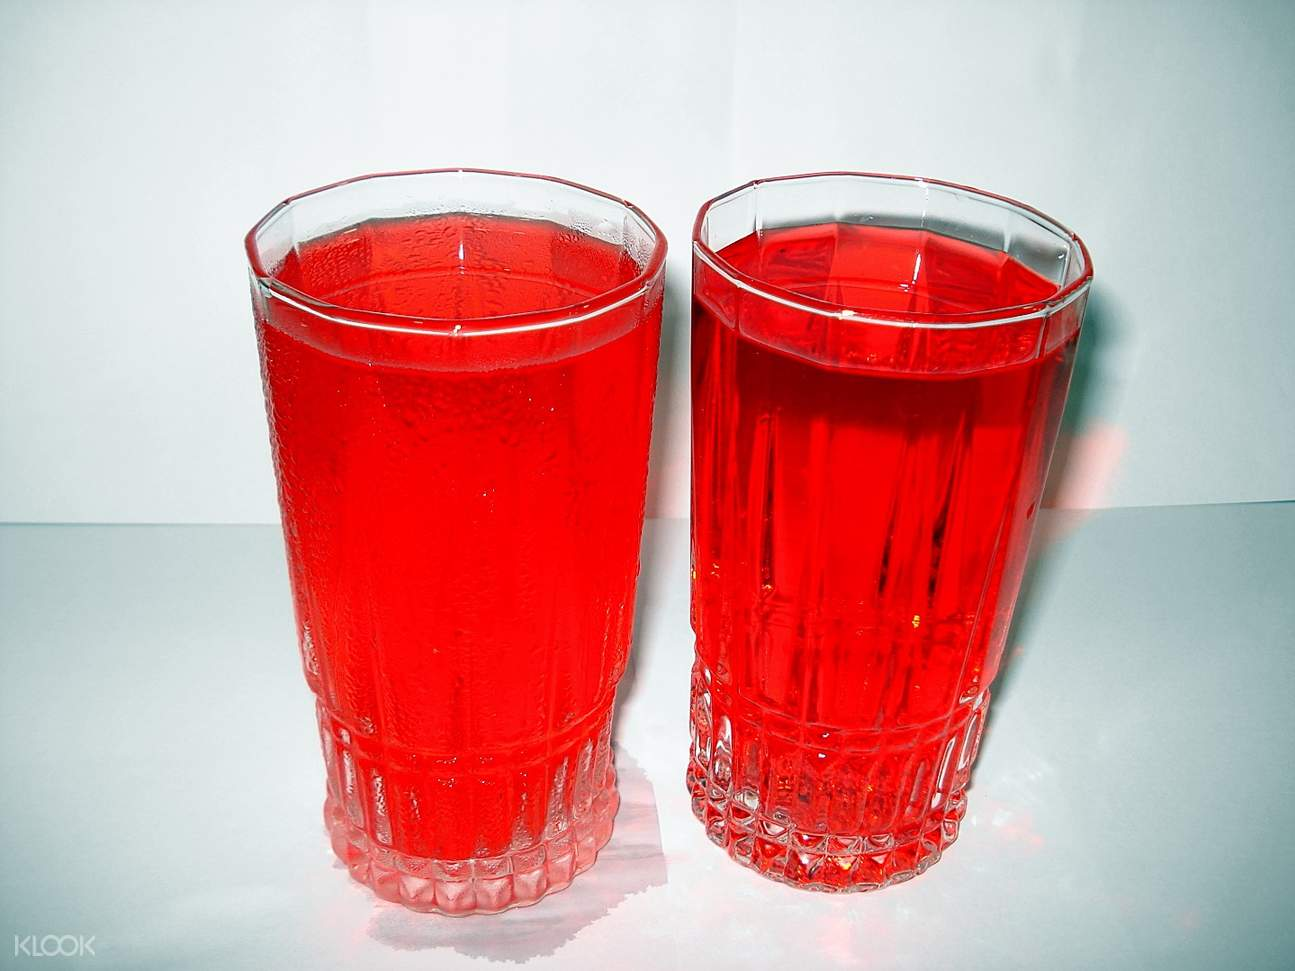 Rajasthani cuisine home-made drinks